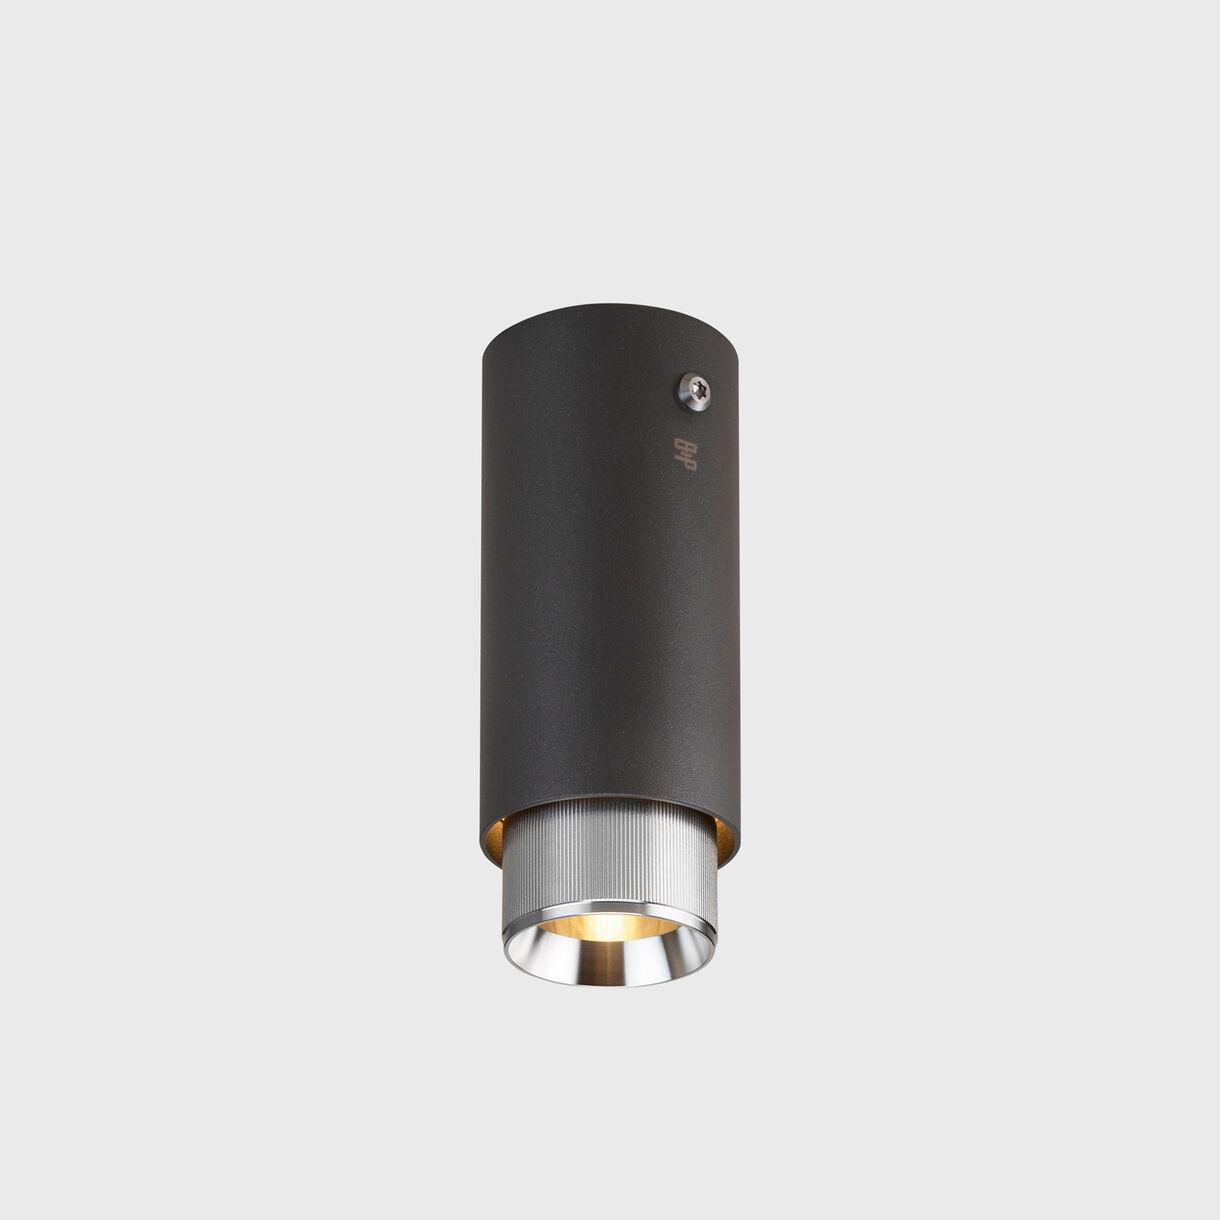 Exhaust Surface Light, Graphite & Steel